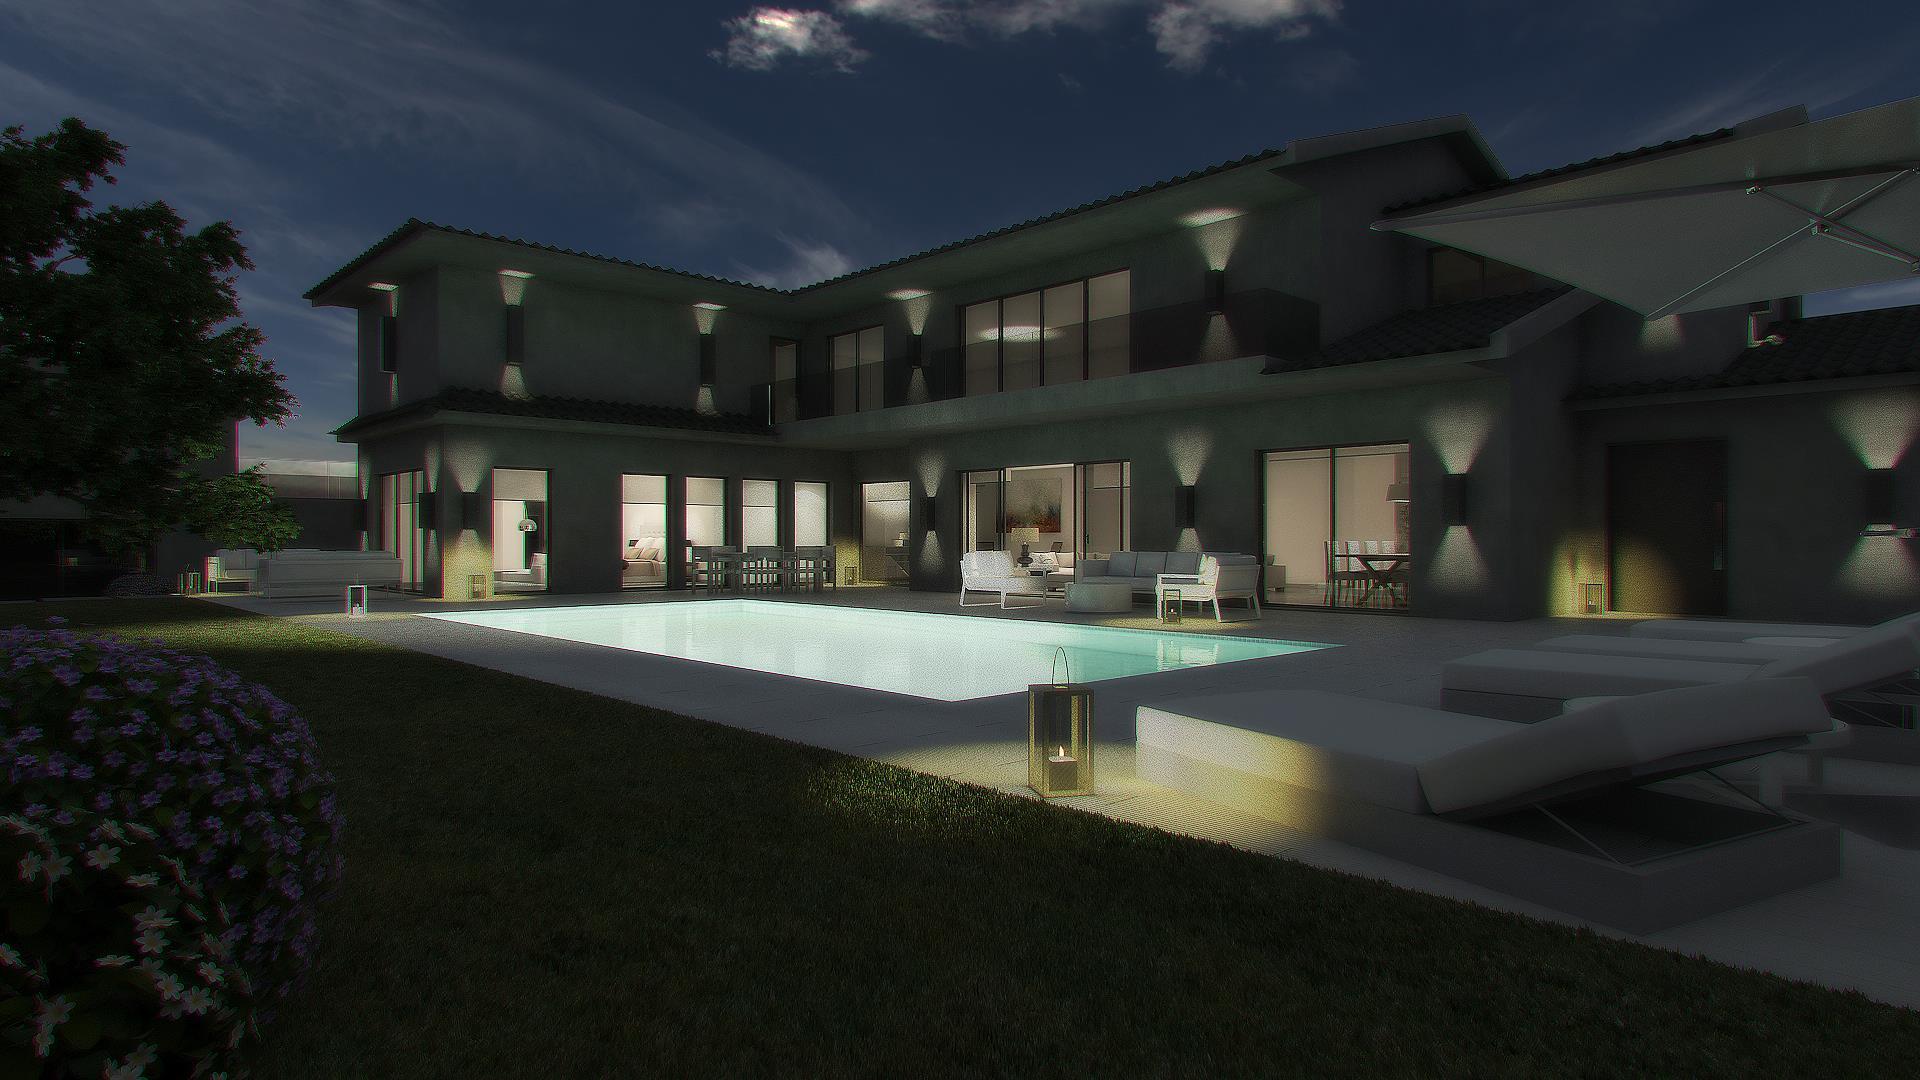 独户住宅 为 销售 在 Detached house, 6 bedrooms, for Sale 卡斯凯什, 葡京, - 葡萄牙